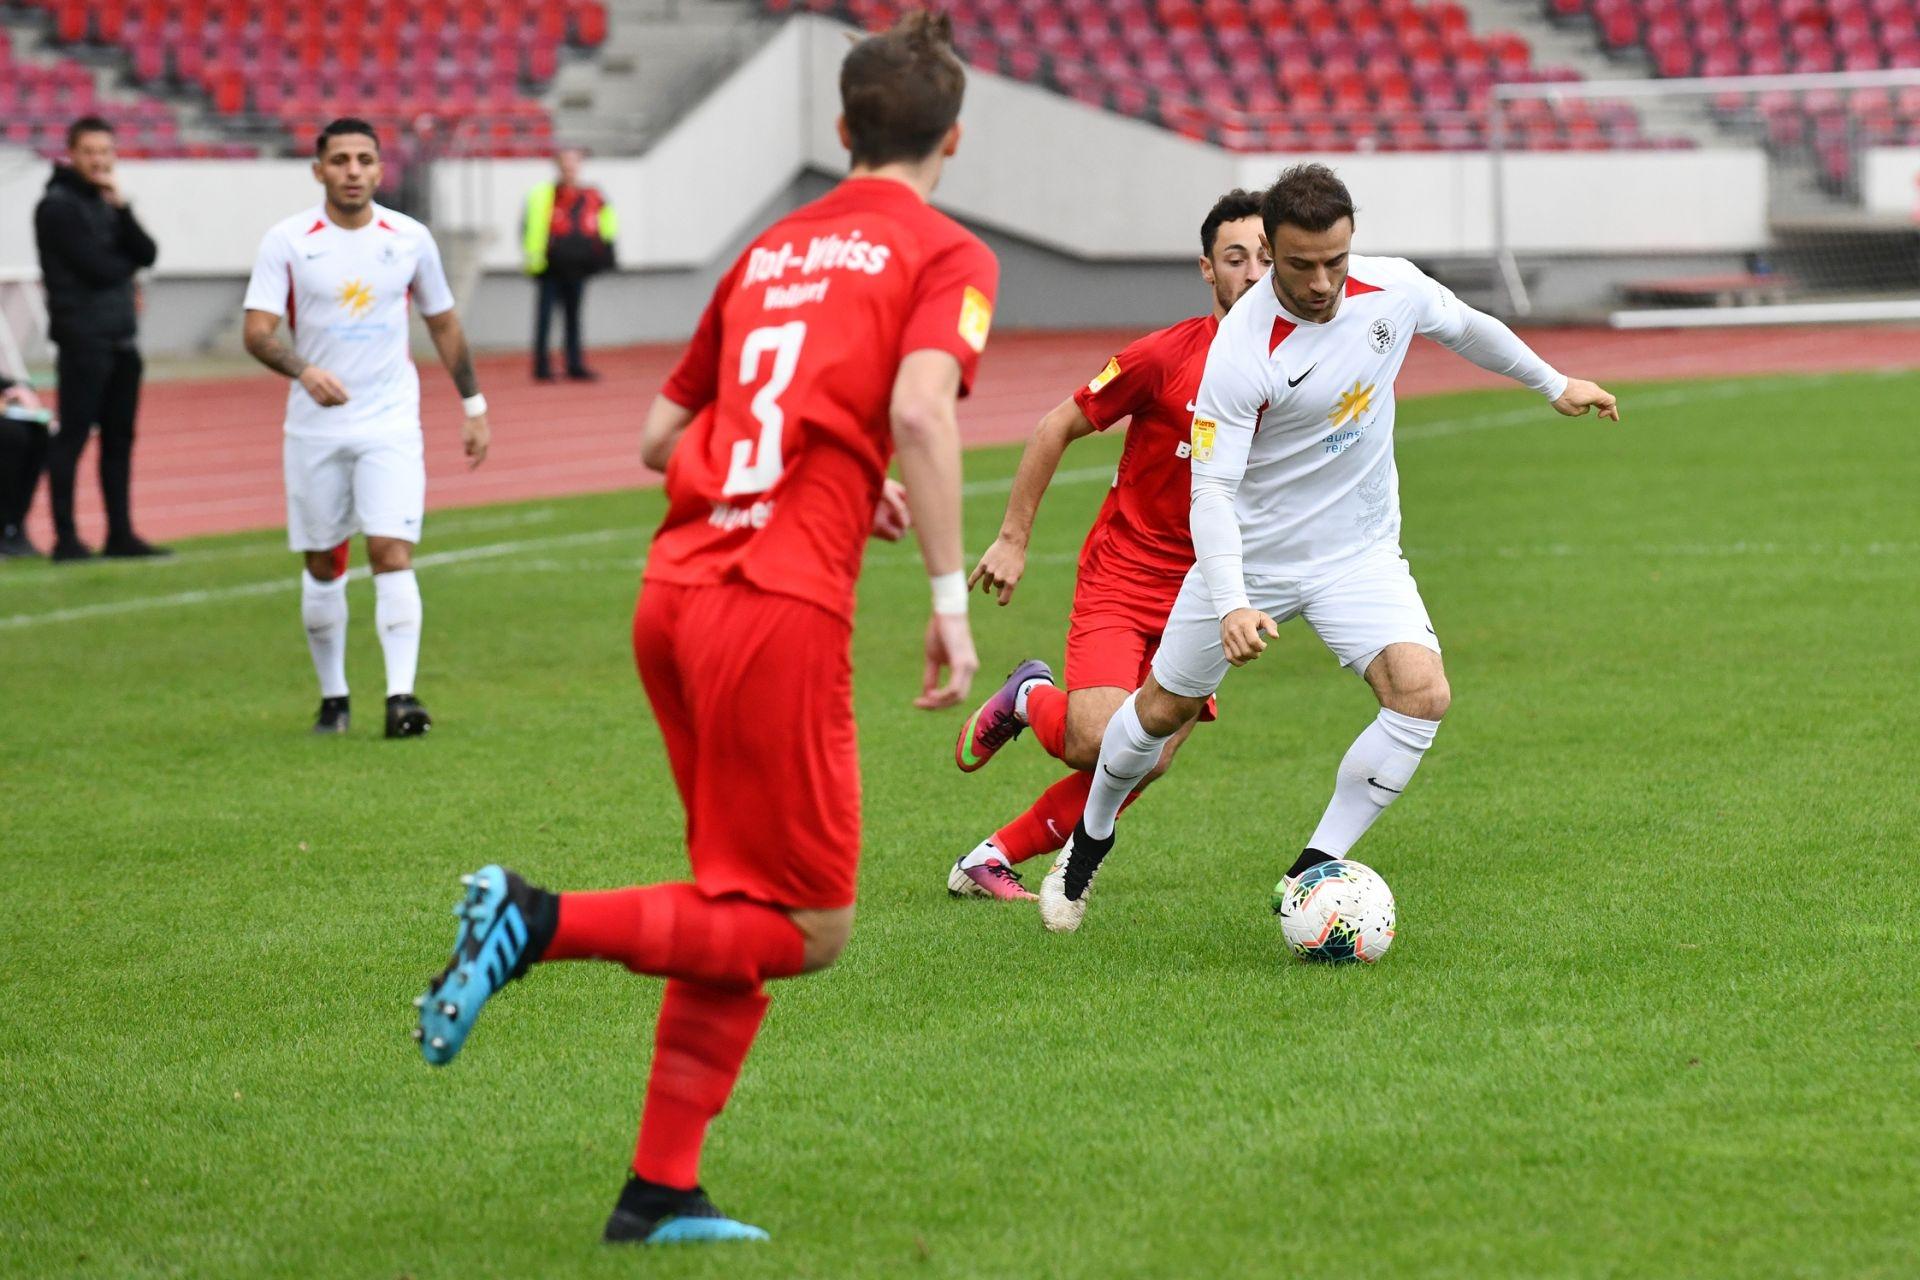 KSV Hessen Kassel, Rot-Weiss Walldorf, Endstand 4:0, Alban Meha (KSV Hessen Kassel)